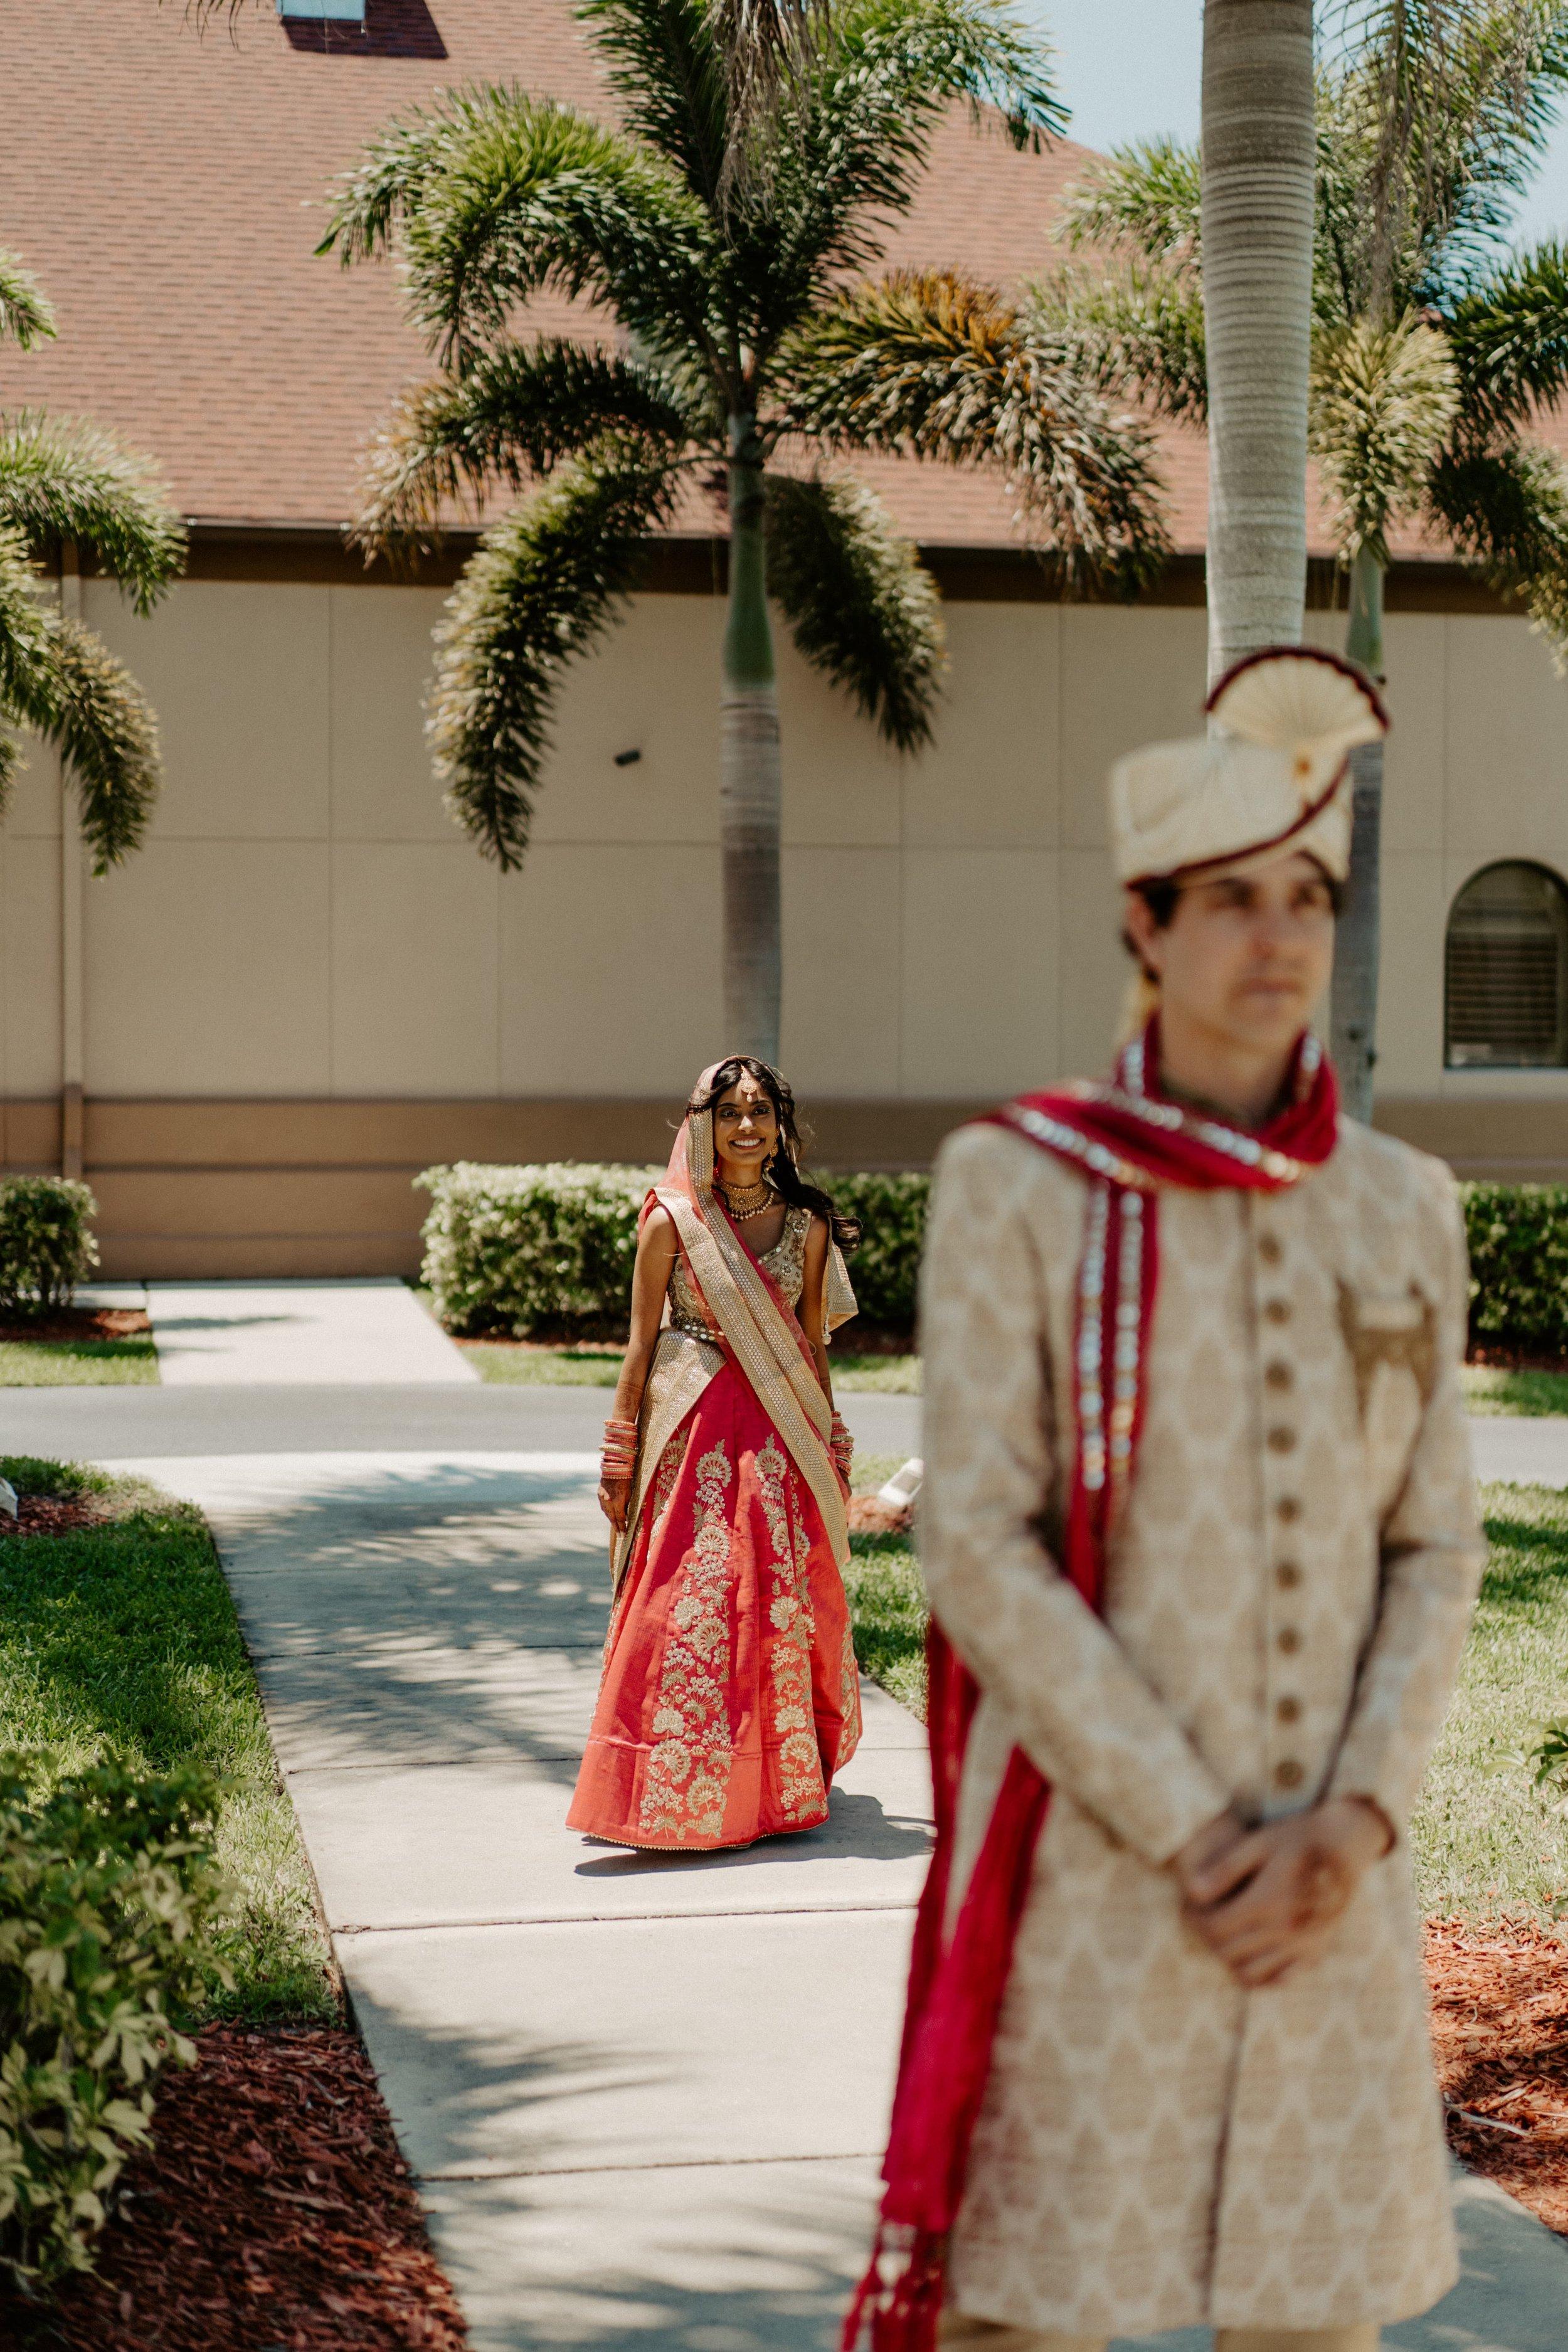 Florid-Hindu-Wedding-St.Petersburg-Florida-Wedding-Photographer-Lens-Culture-Photography-Shahnasarian-Hall-Wedding